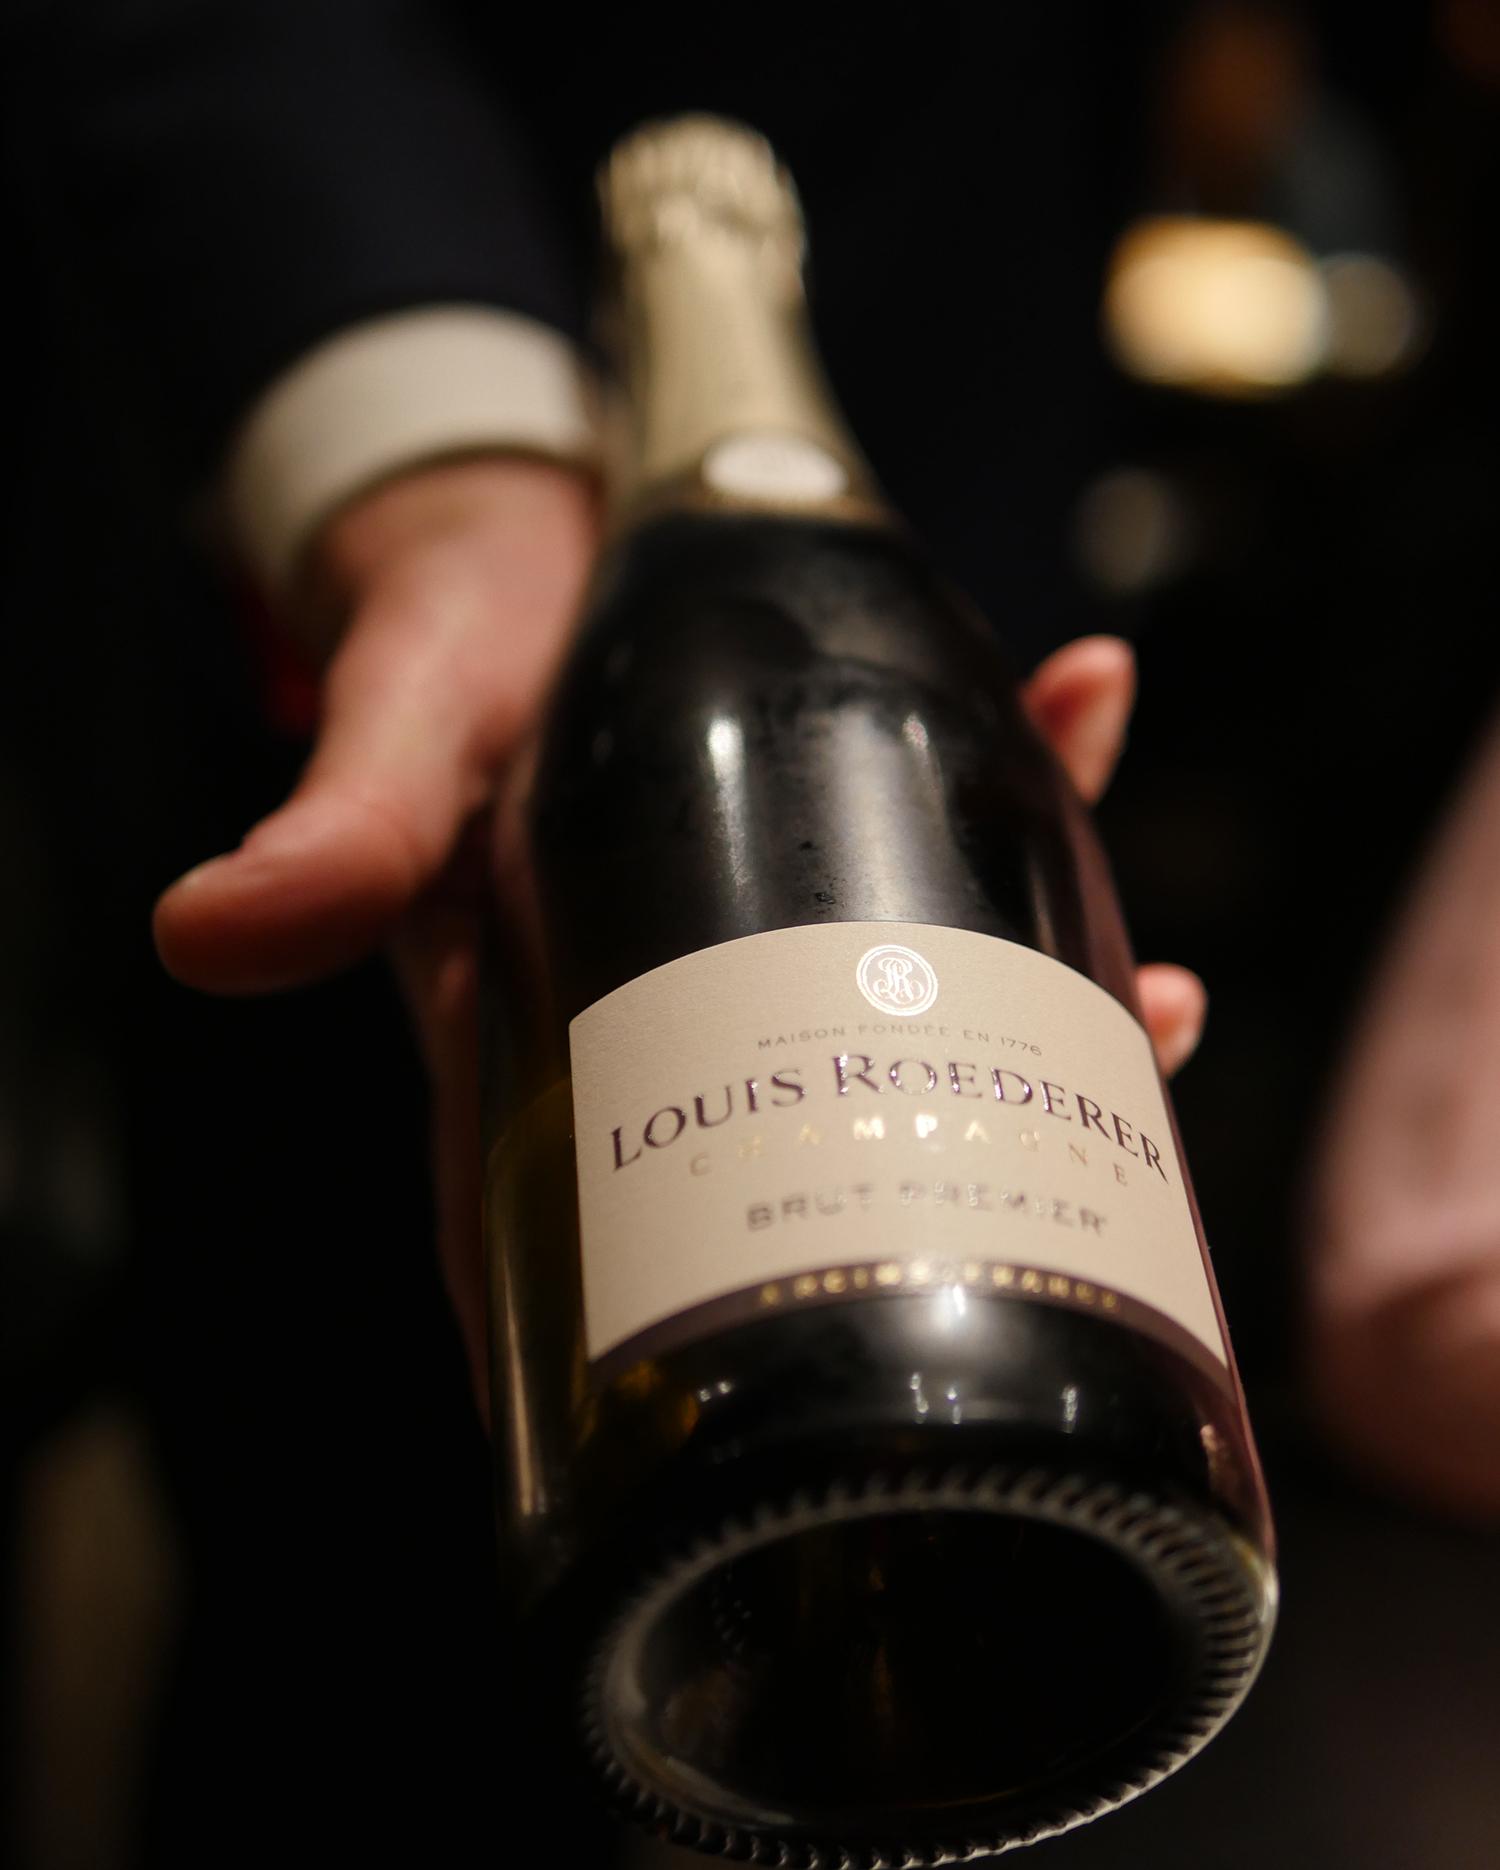 Hakkasan Dim Sum Sunday - Louis Roederer Champagne